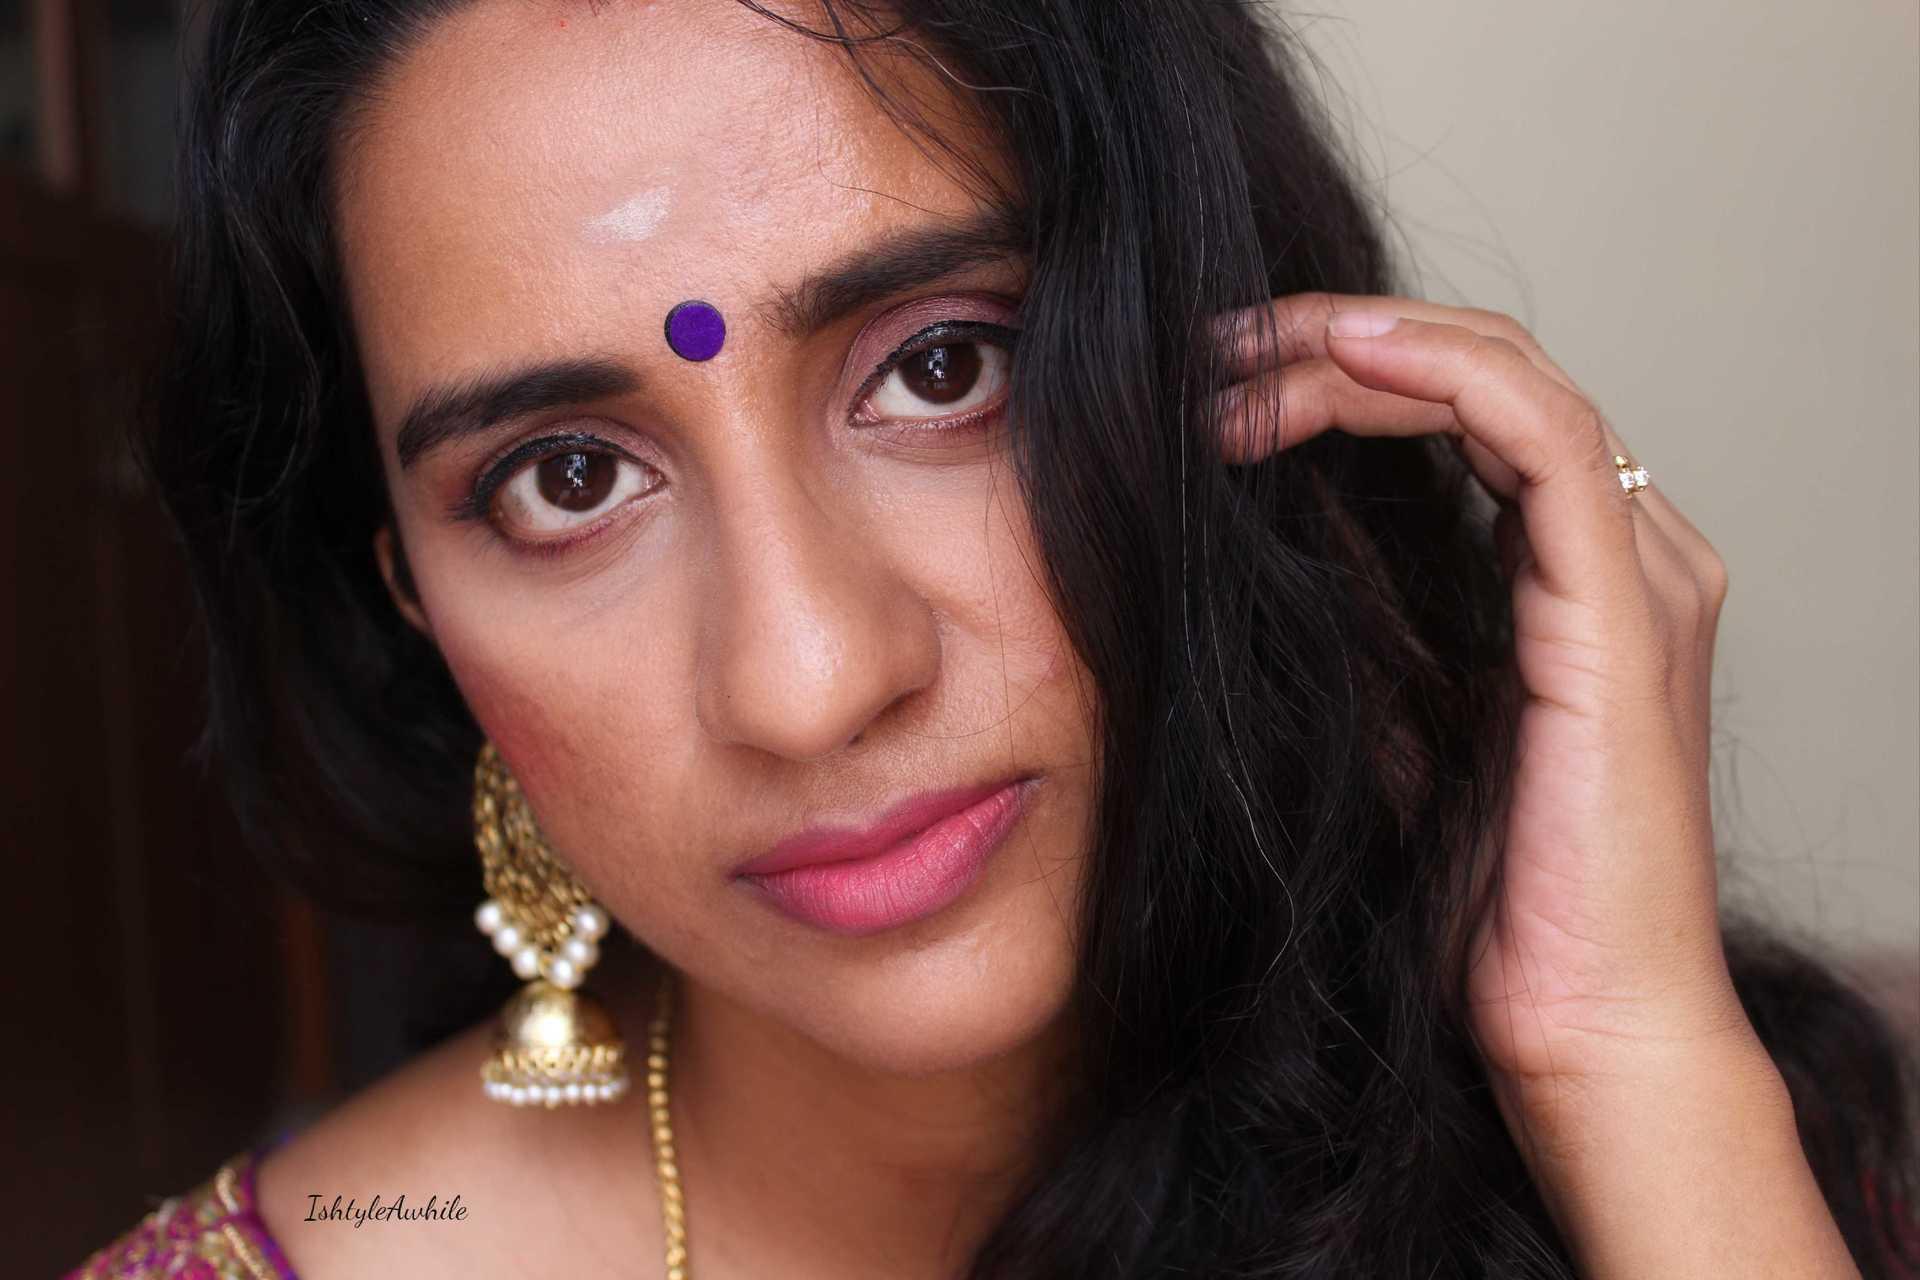 IshtyleAwhile - Spekta Cosmetics_Lipstick in Alpha